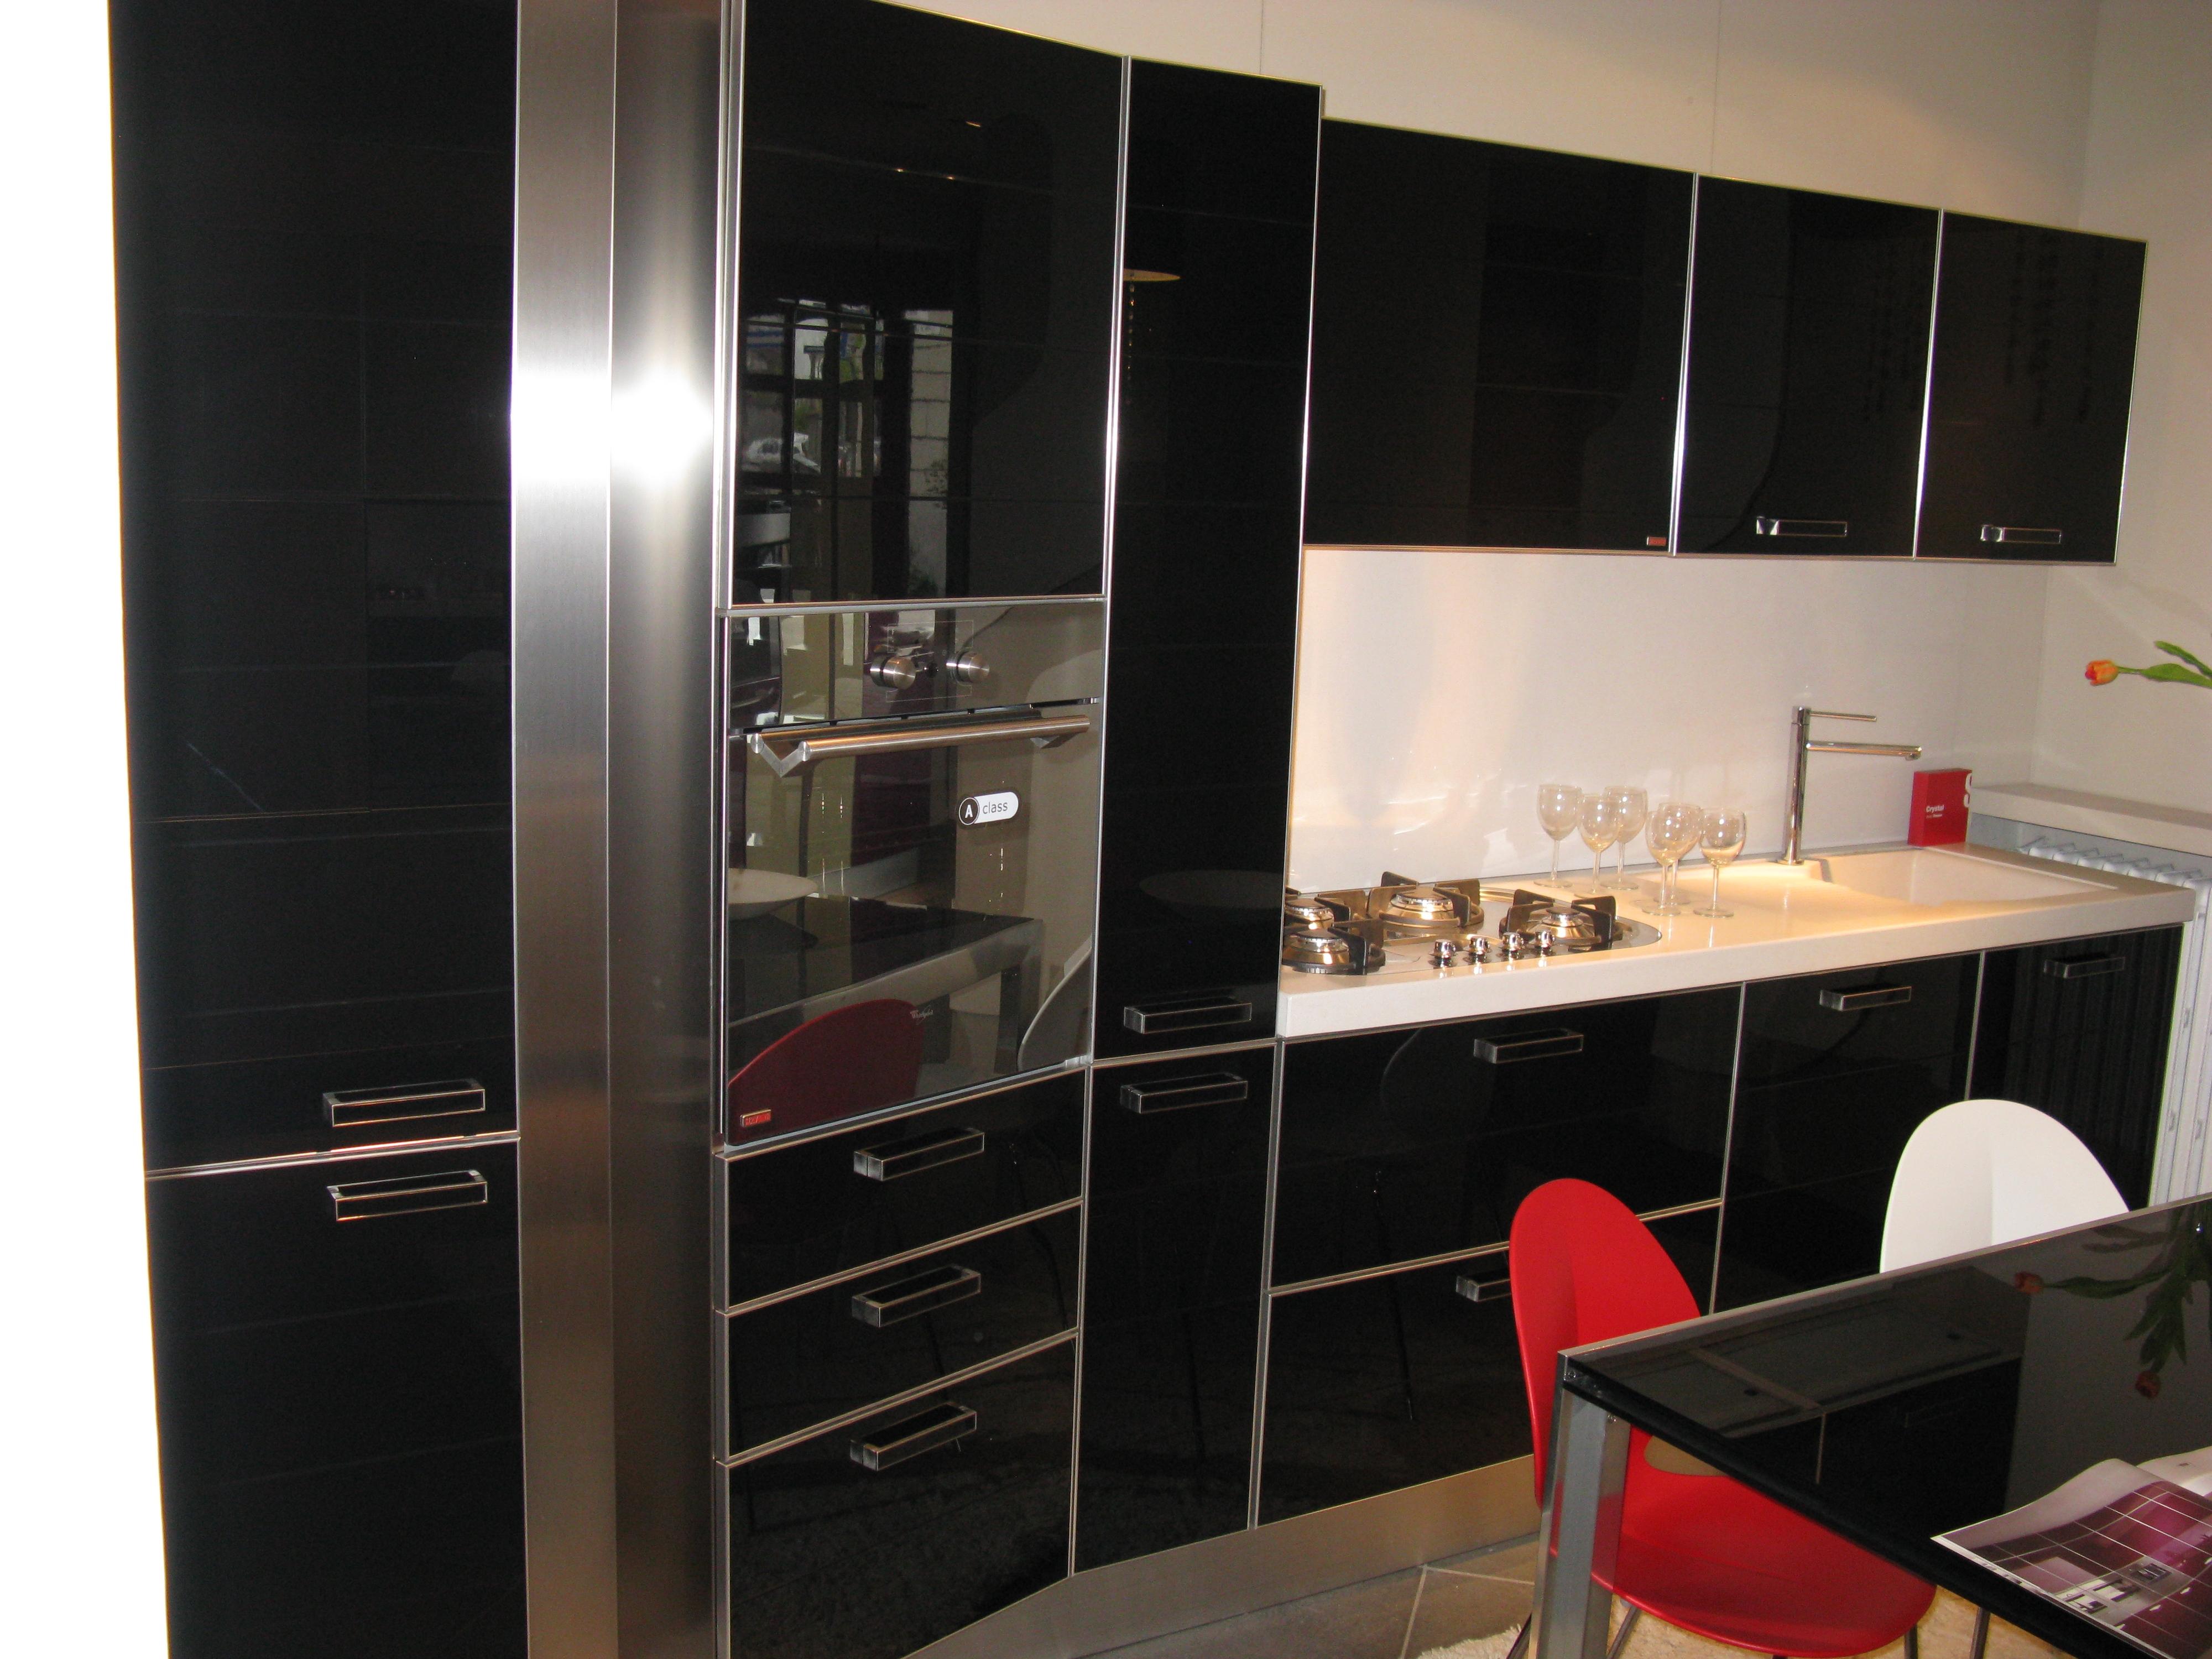 Scavolini cucina crystal cucine a prezzi scontati - Cucine 3 metri scavolini ...